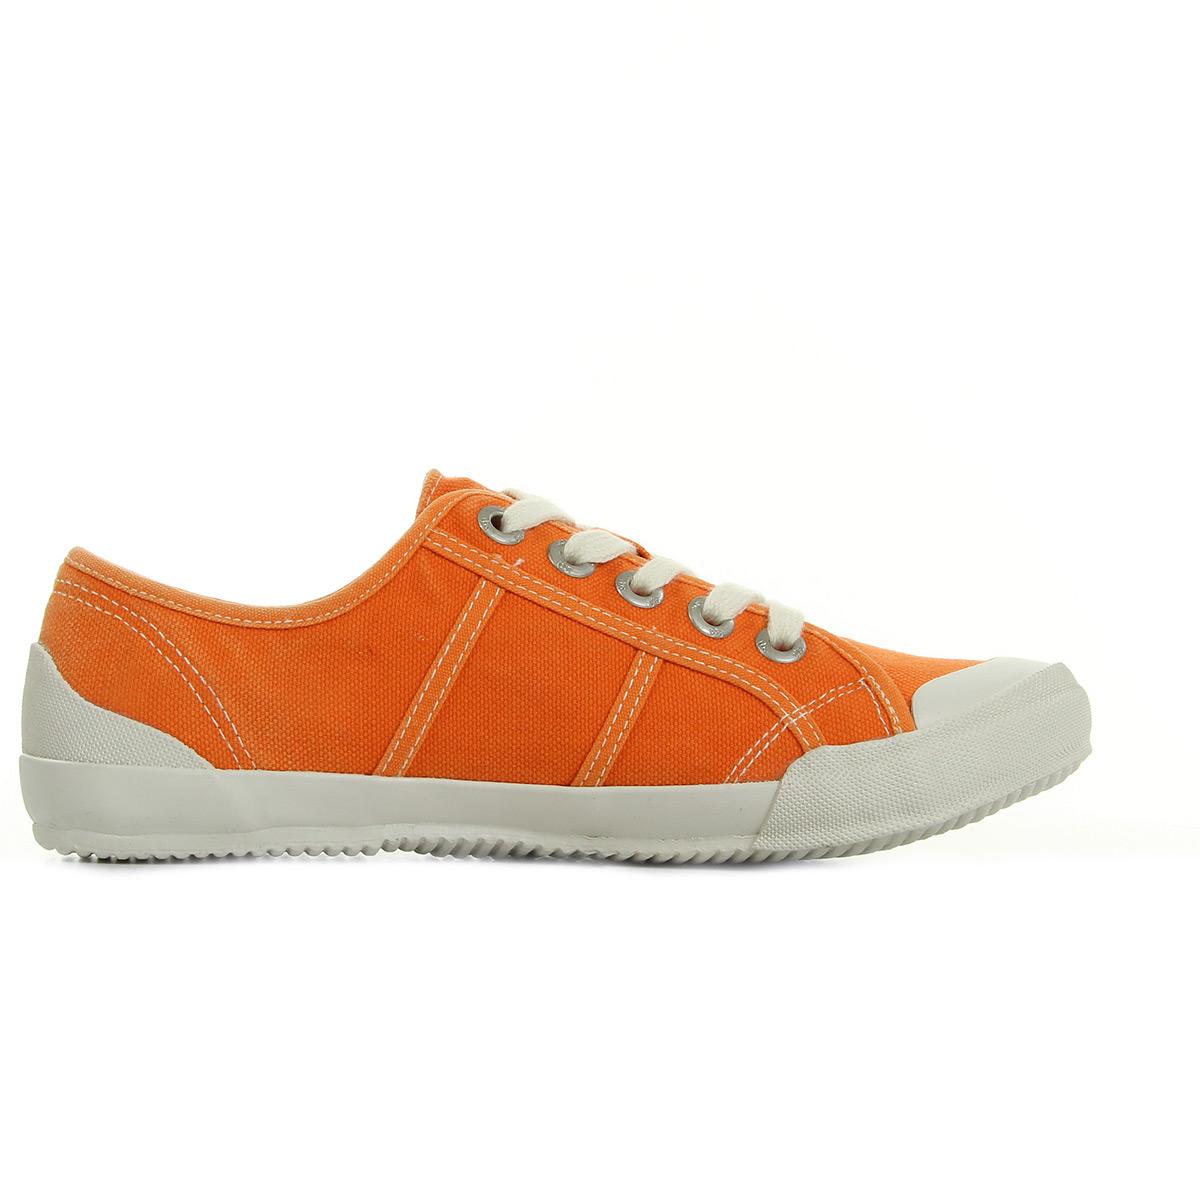 tbs Opiace Orange S7029ORANGE, Baskets mode femme